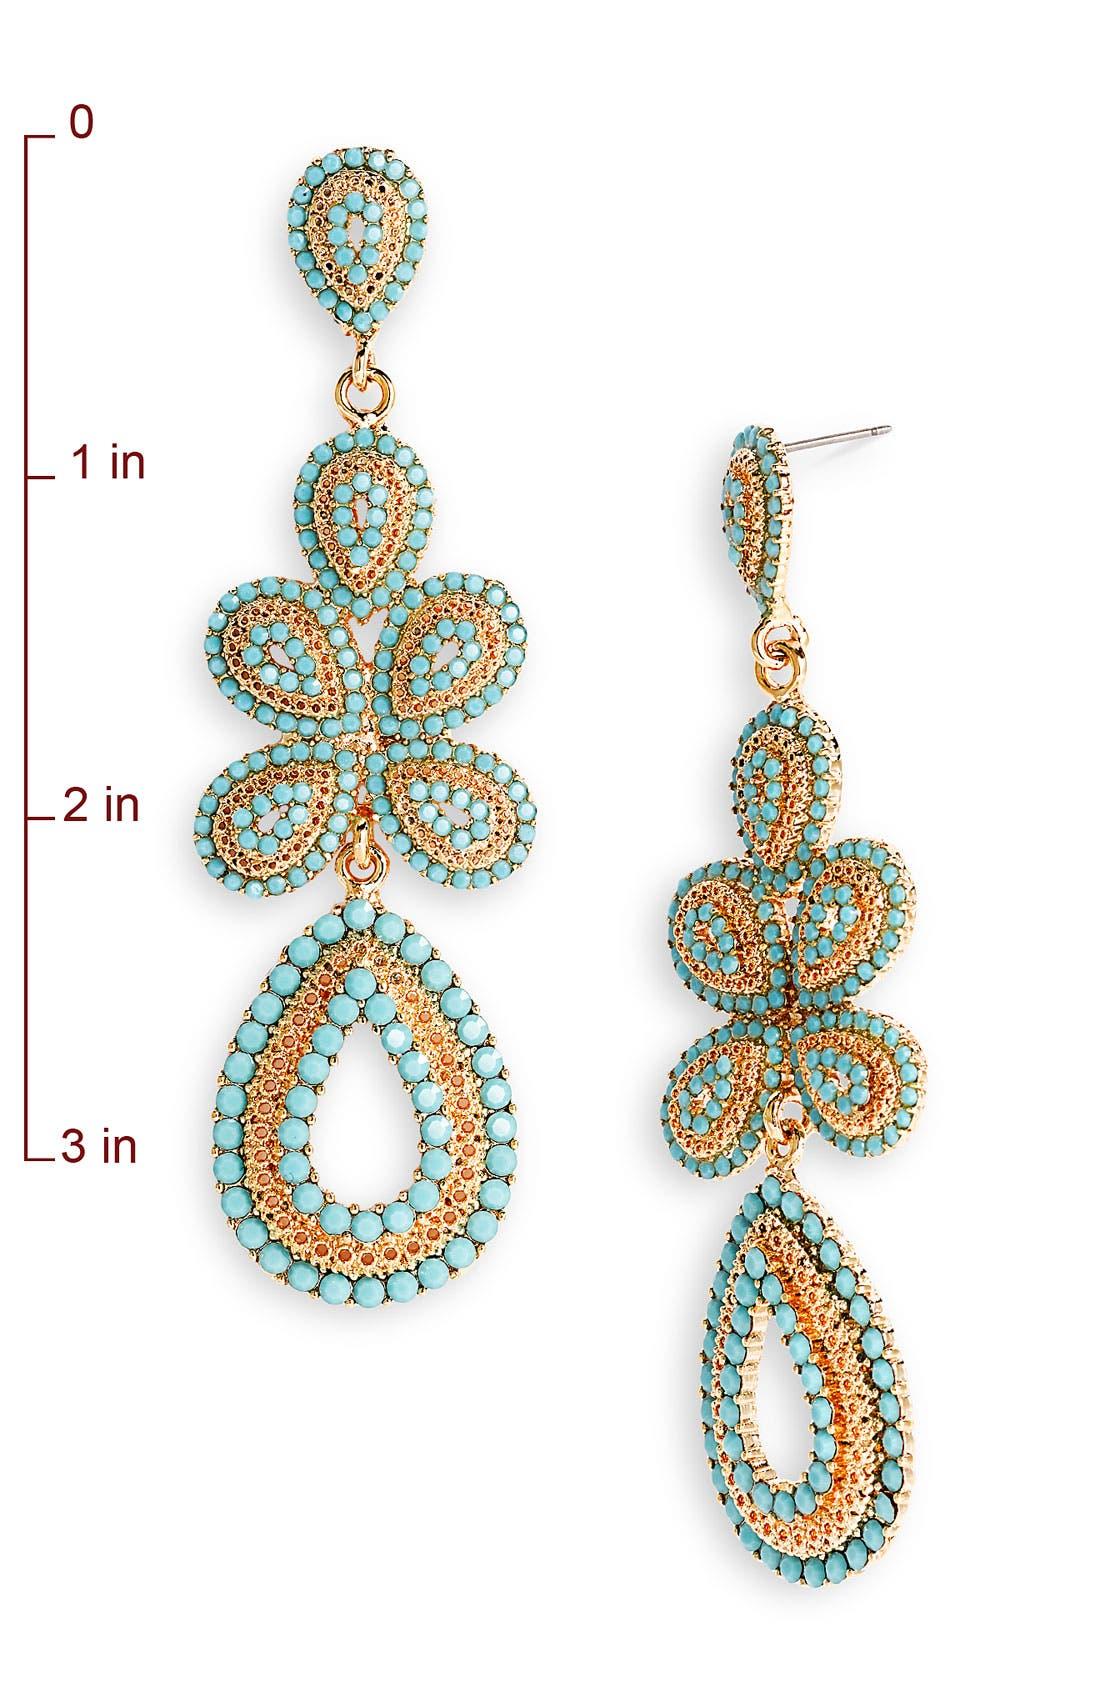 'Ornate' Linear Statement Earrings,                             Alternate thumbnail 25, color,